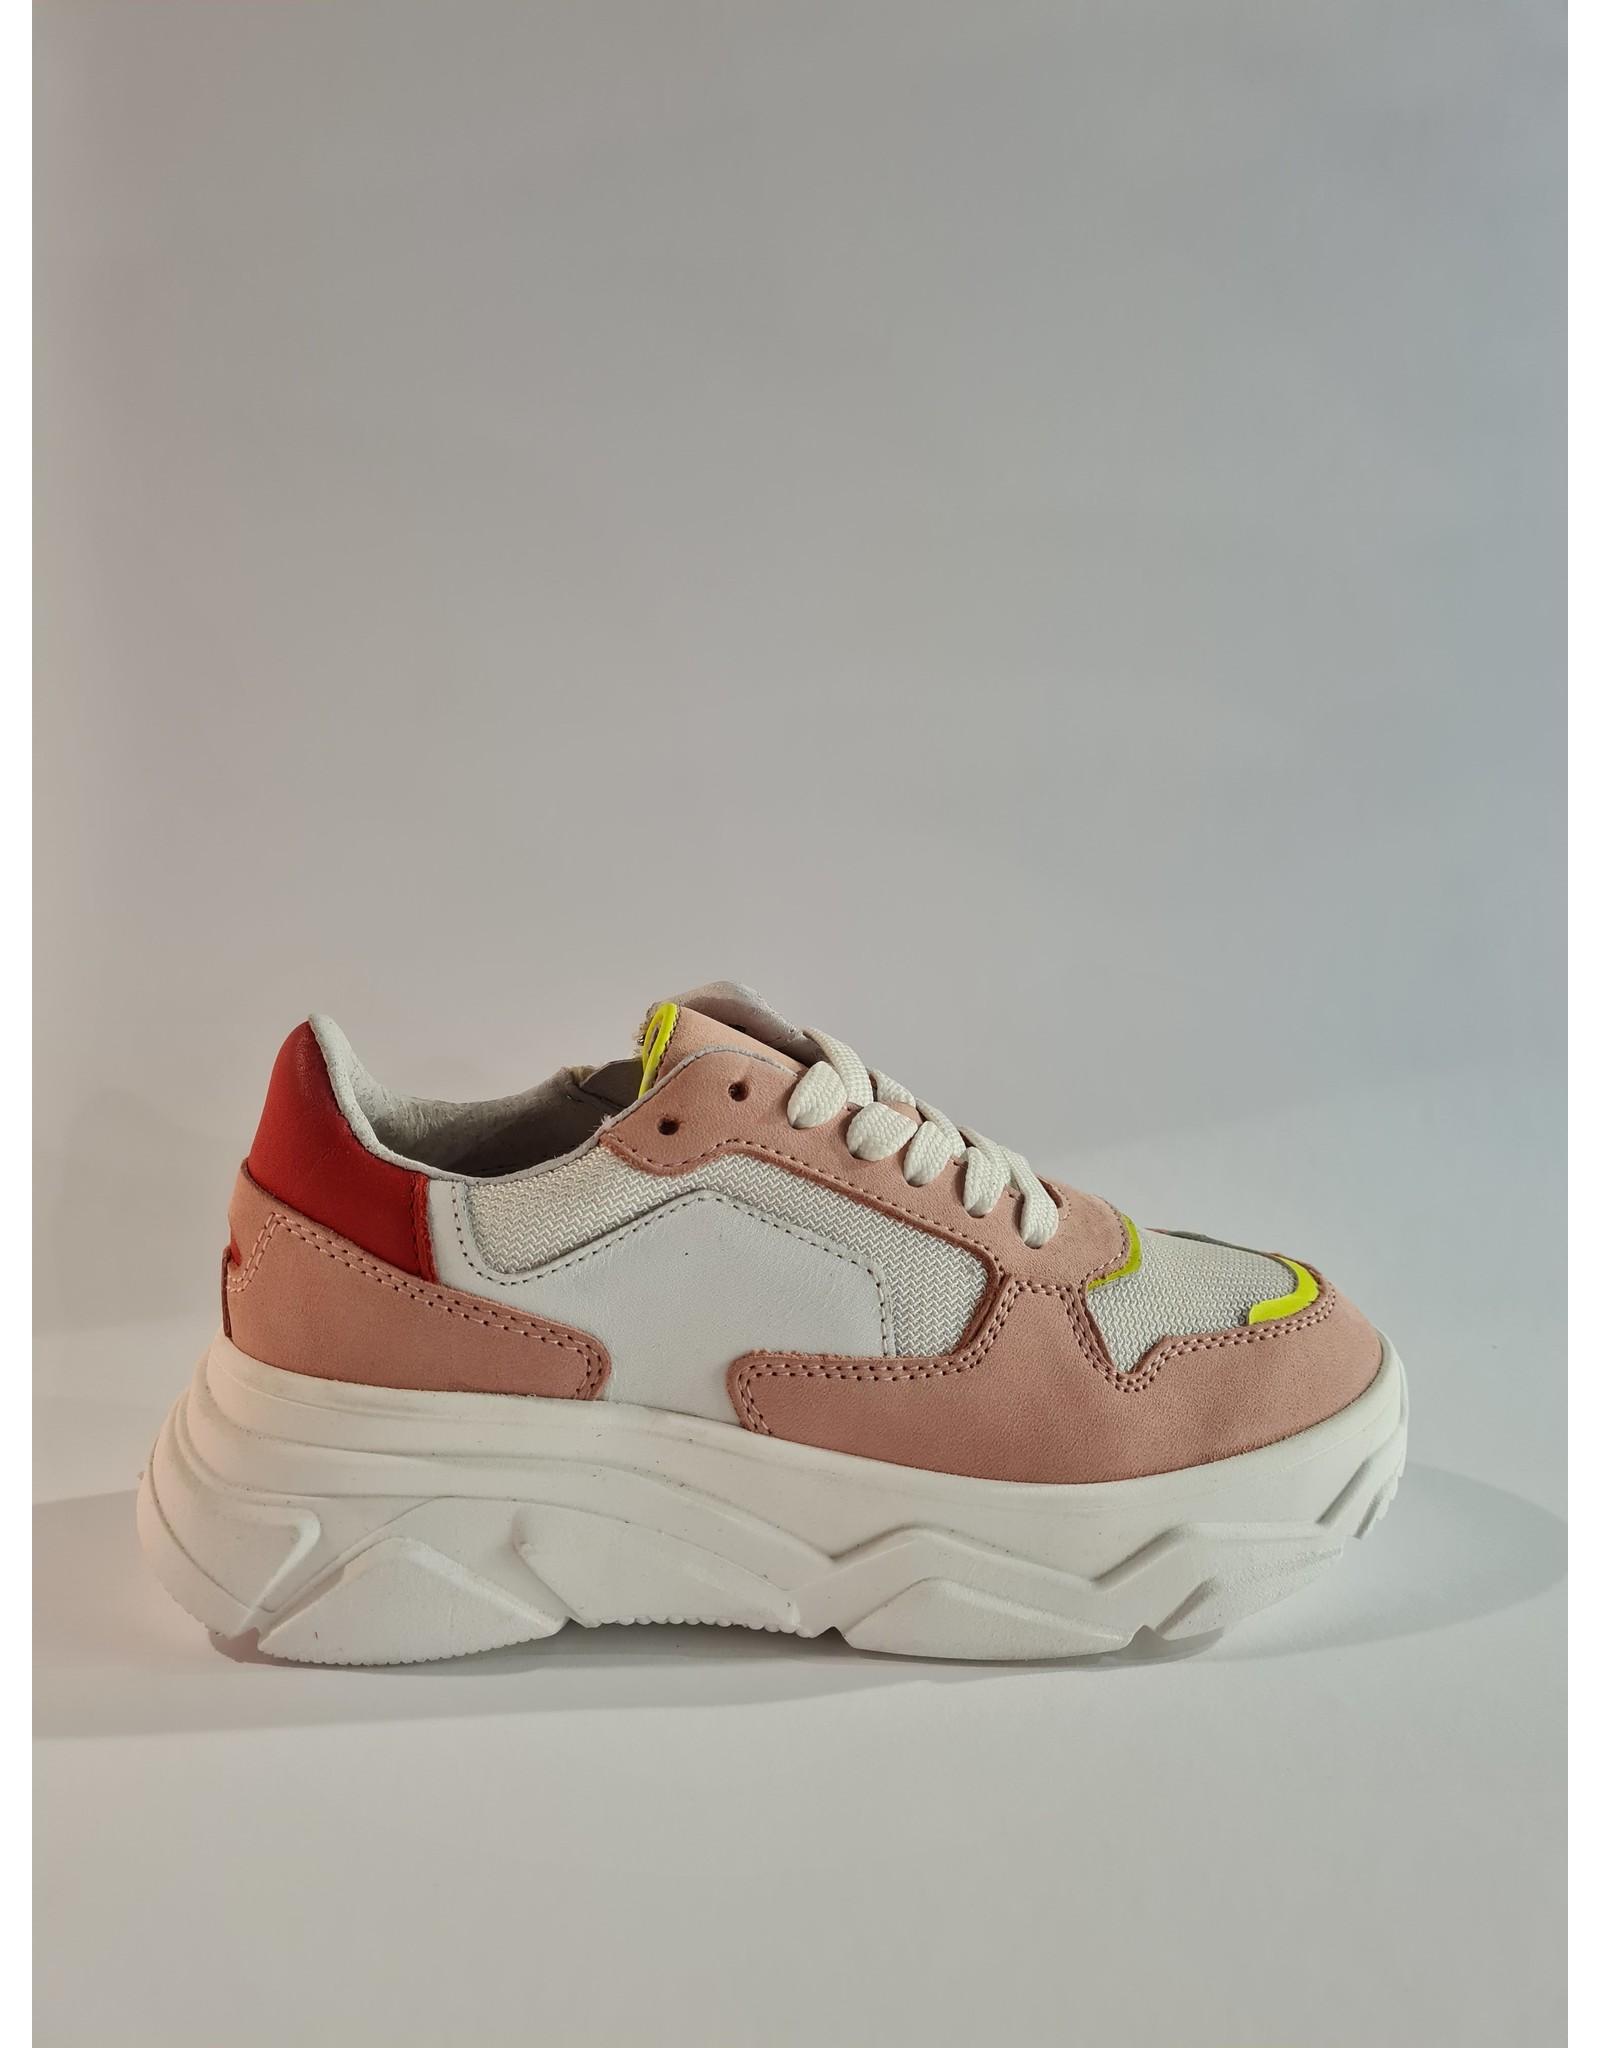 Gattino Gattino - Meisjes Sneaker Roze Wit